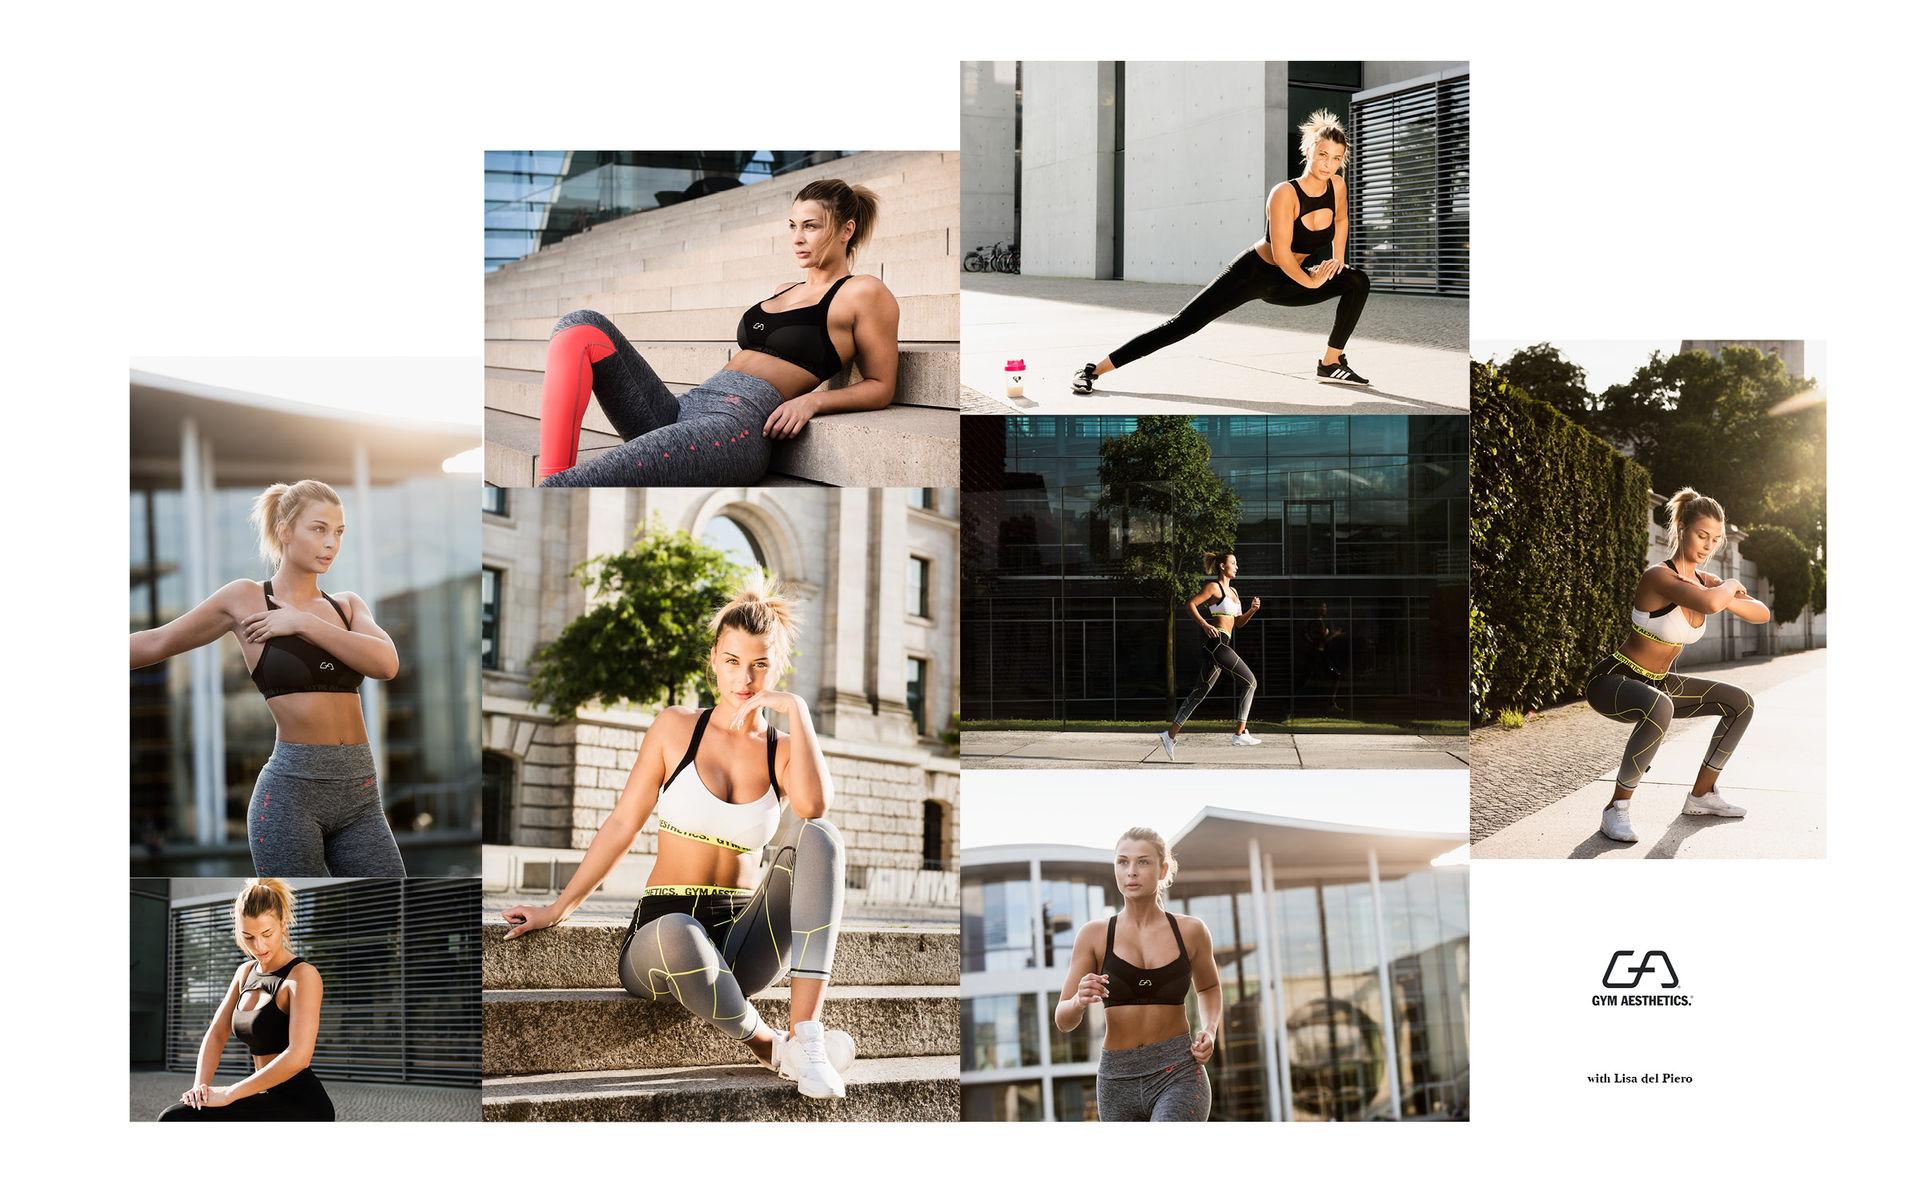 Markus-Henttonen-campaigns-Fitness